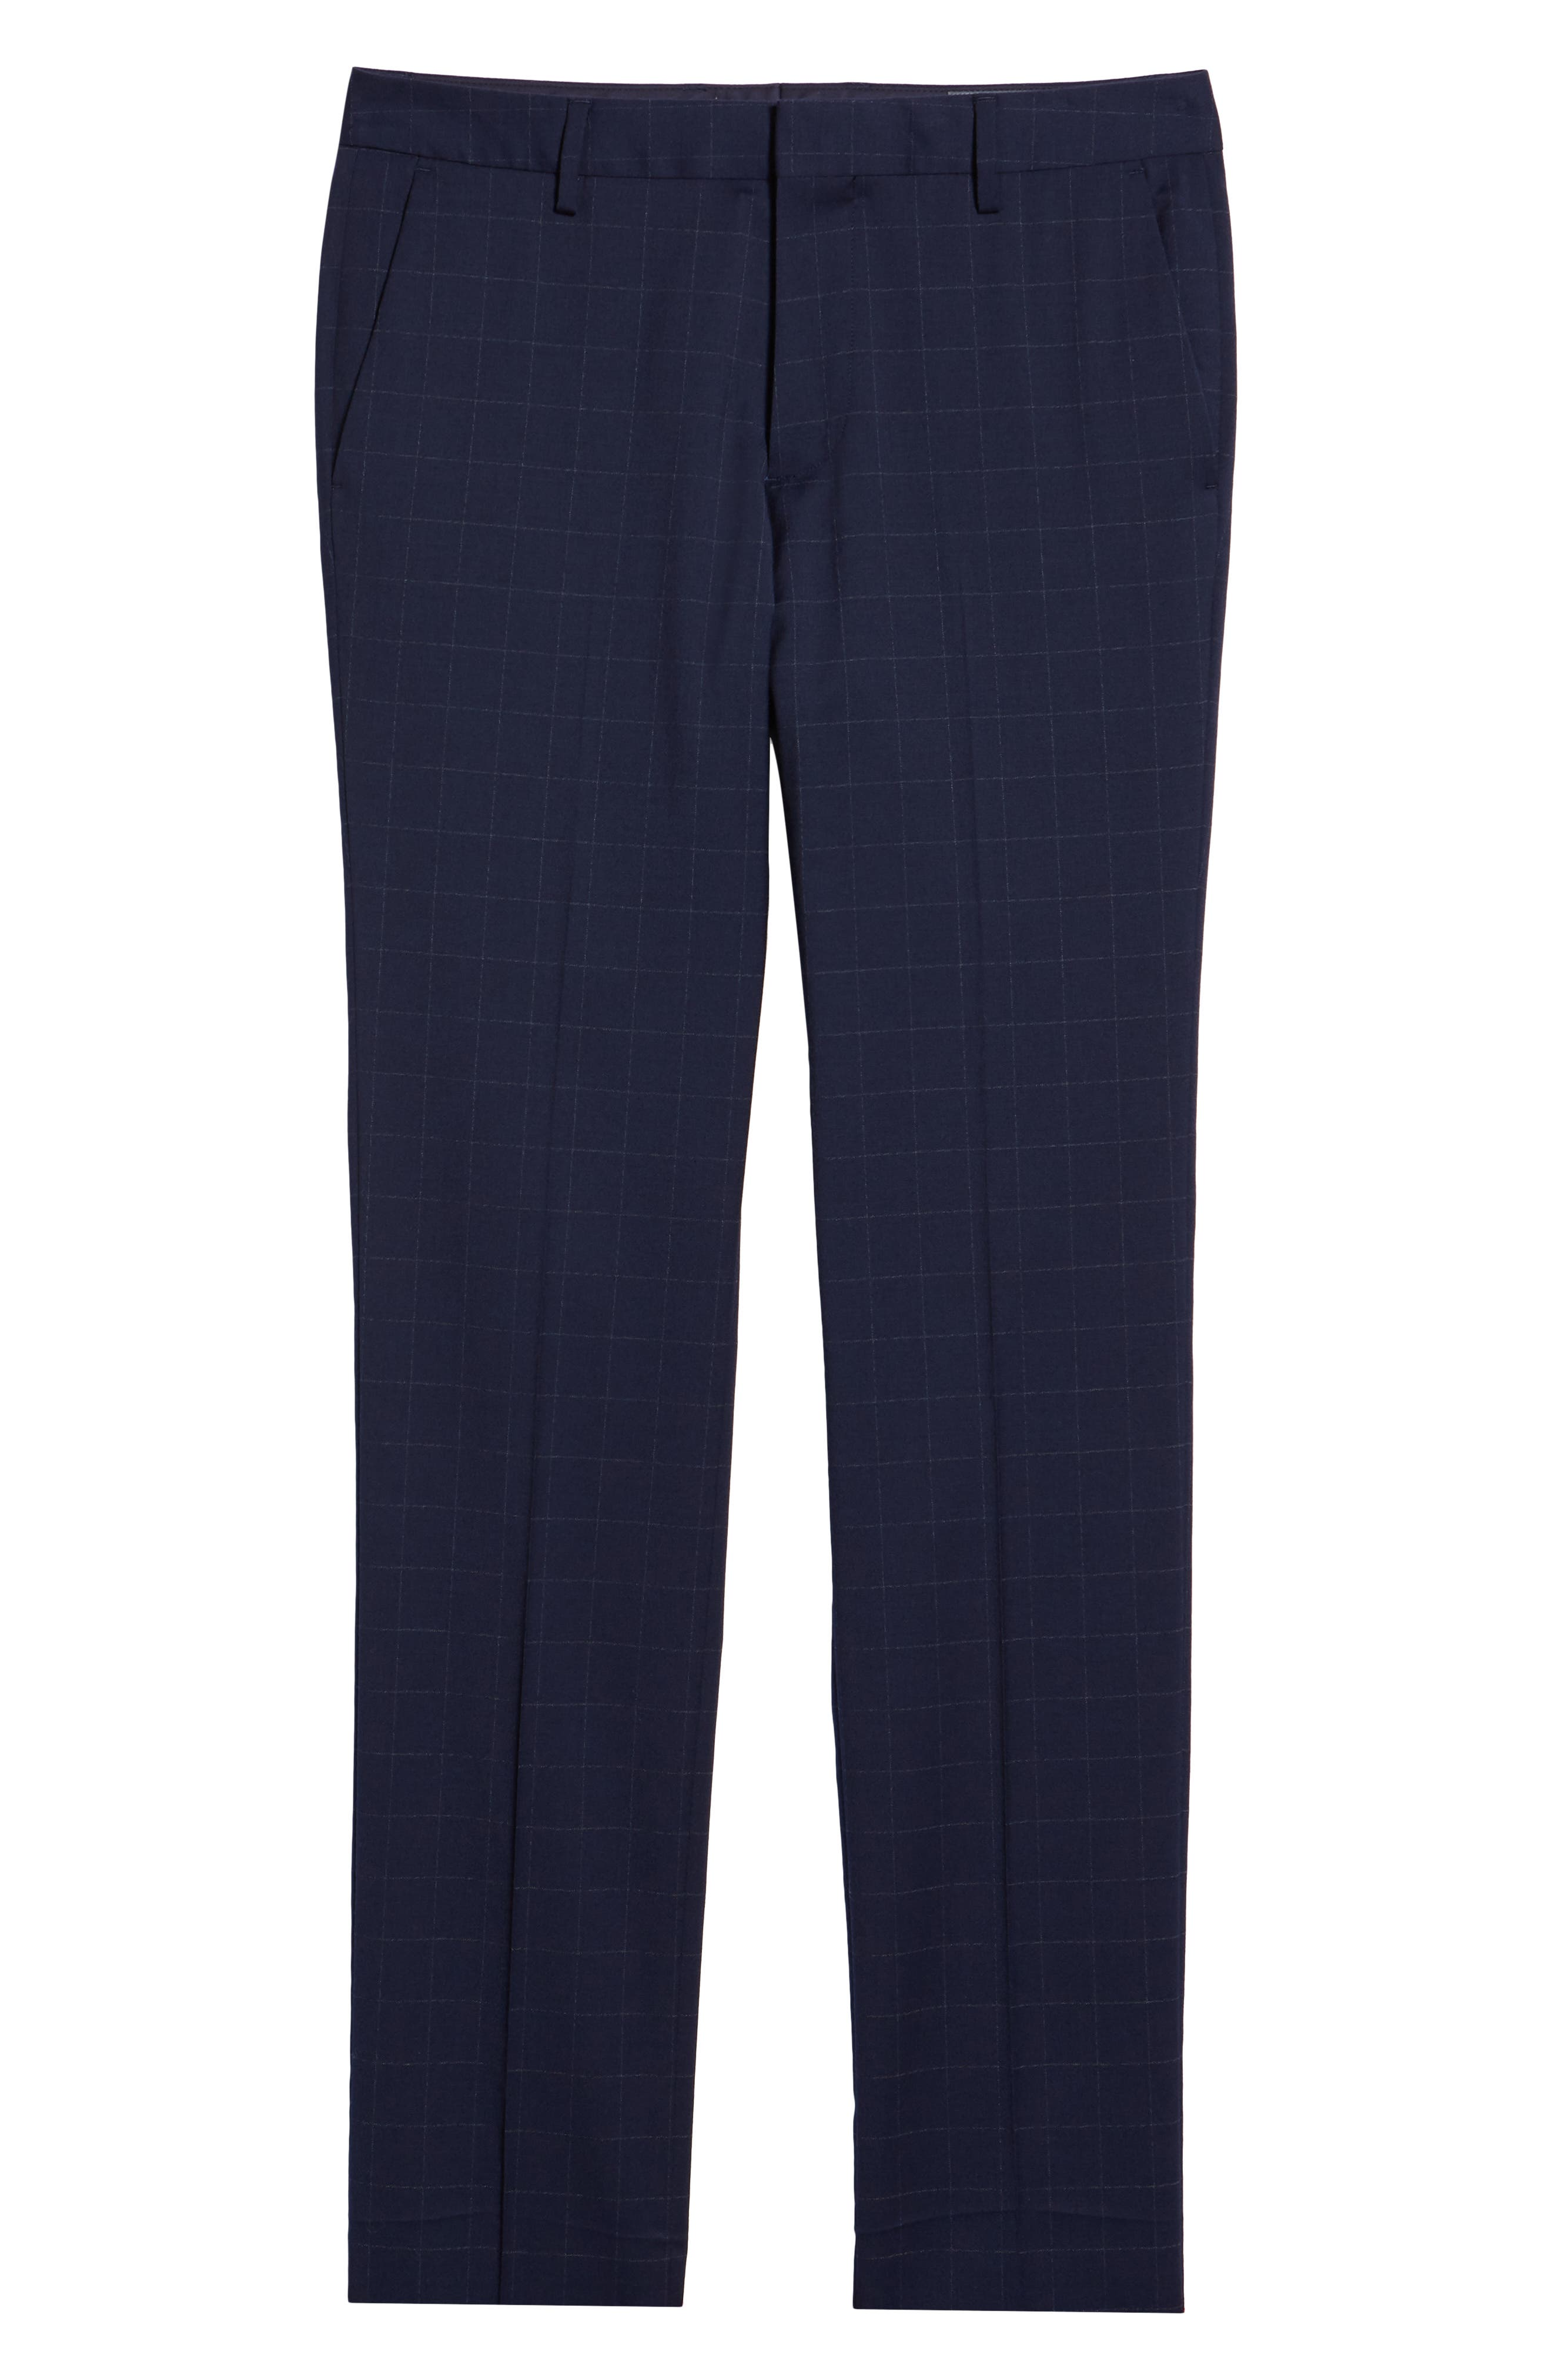 BONOBOS, Jetsetter Slim Fit Stretch Suit Pants, Alternate thumbnail 6, color, NAVY CHALK WINDOWPANE